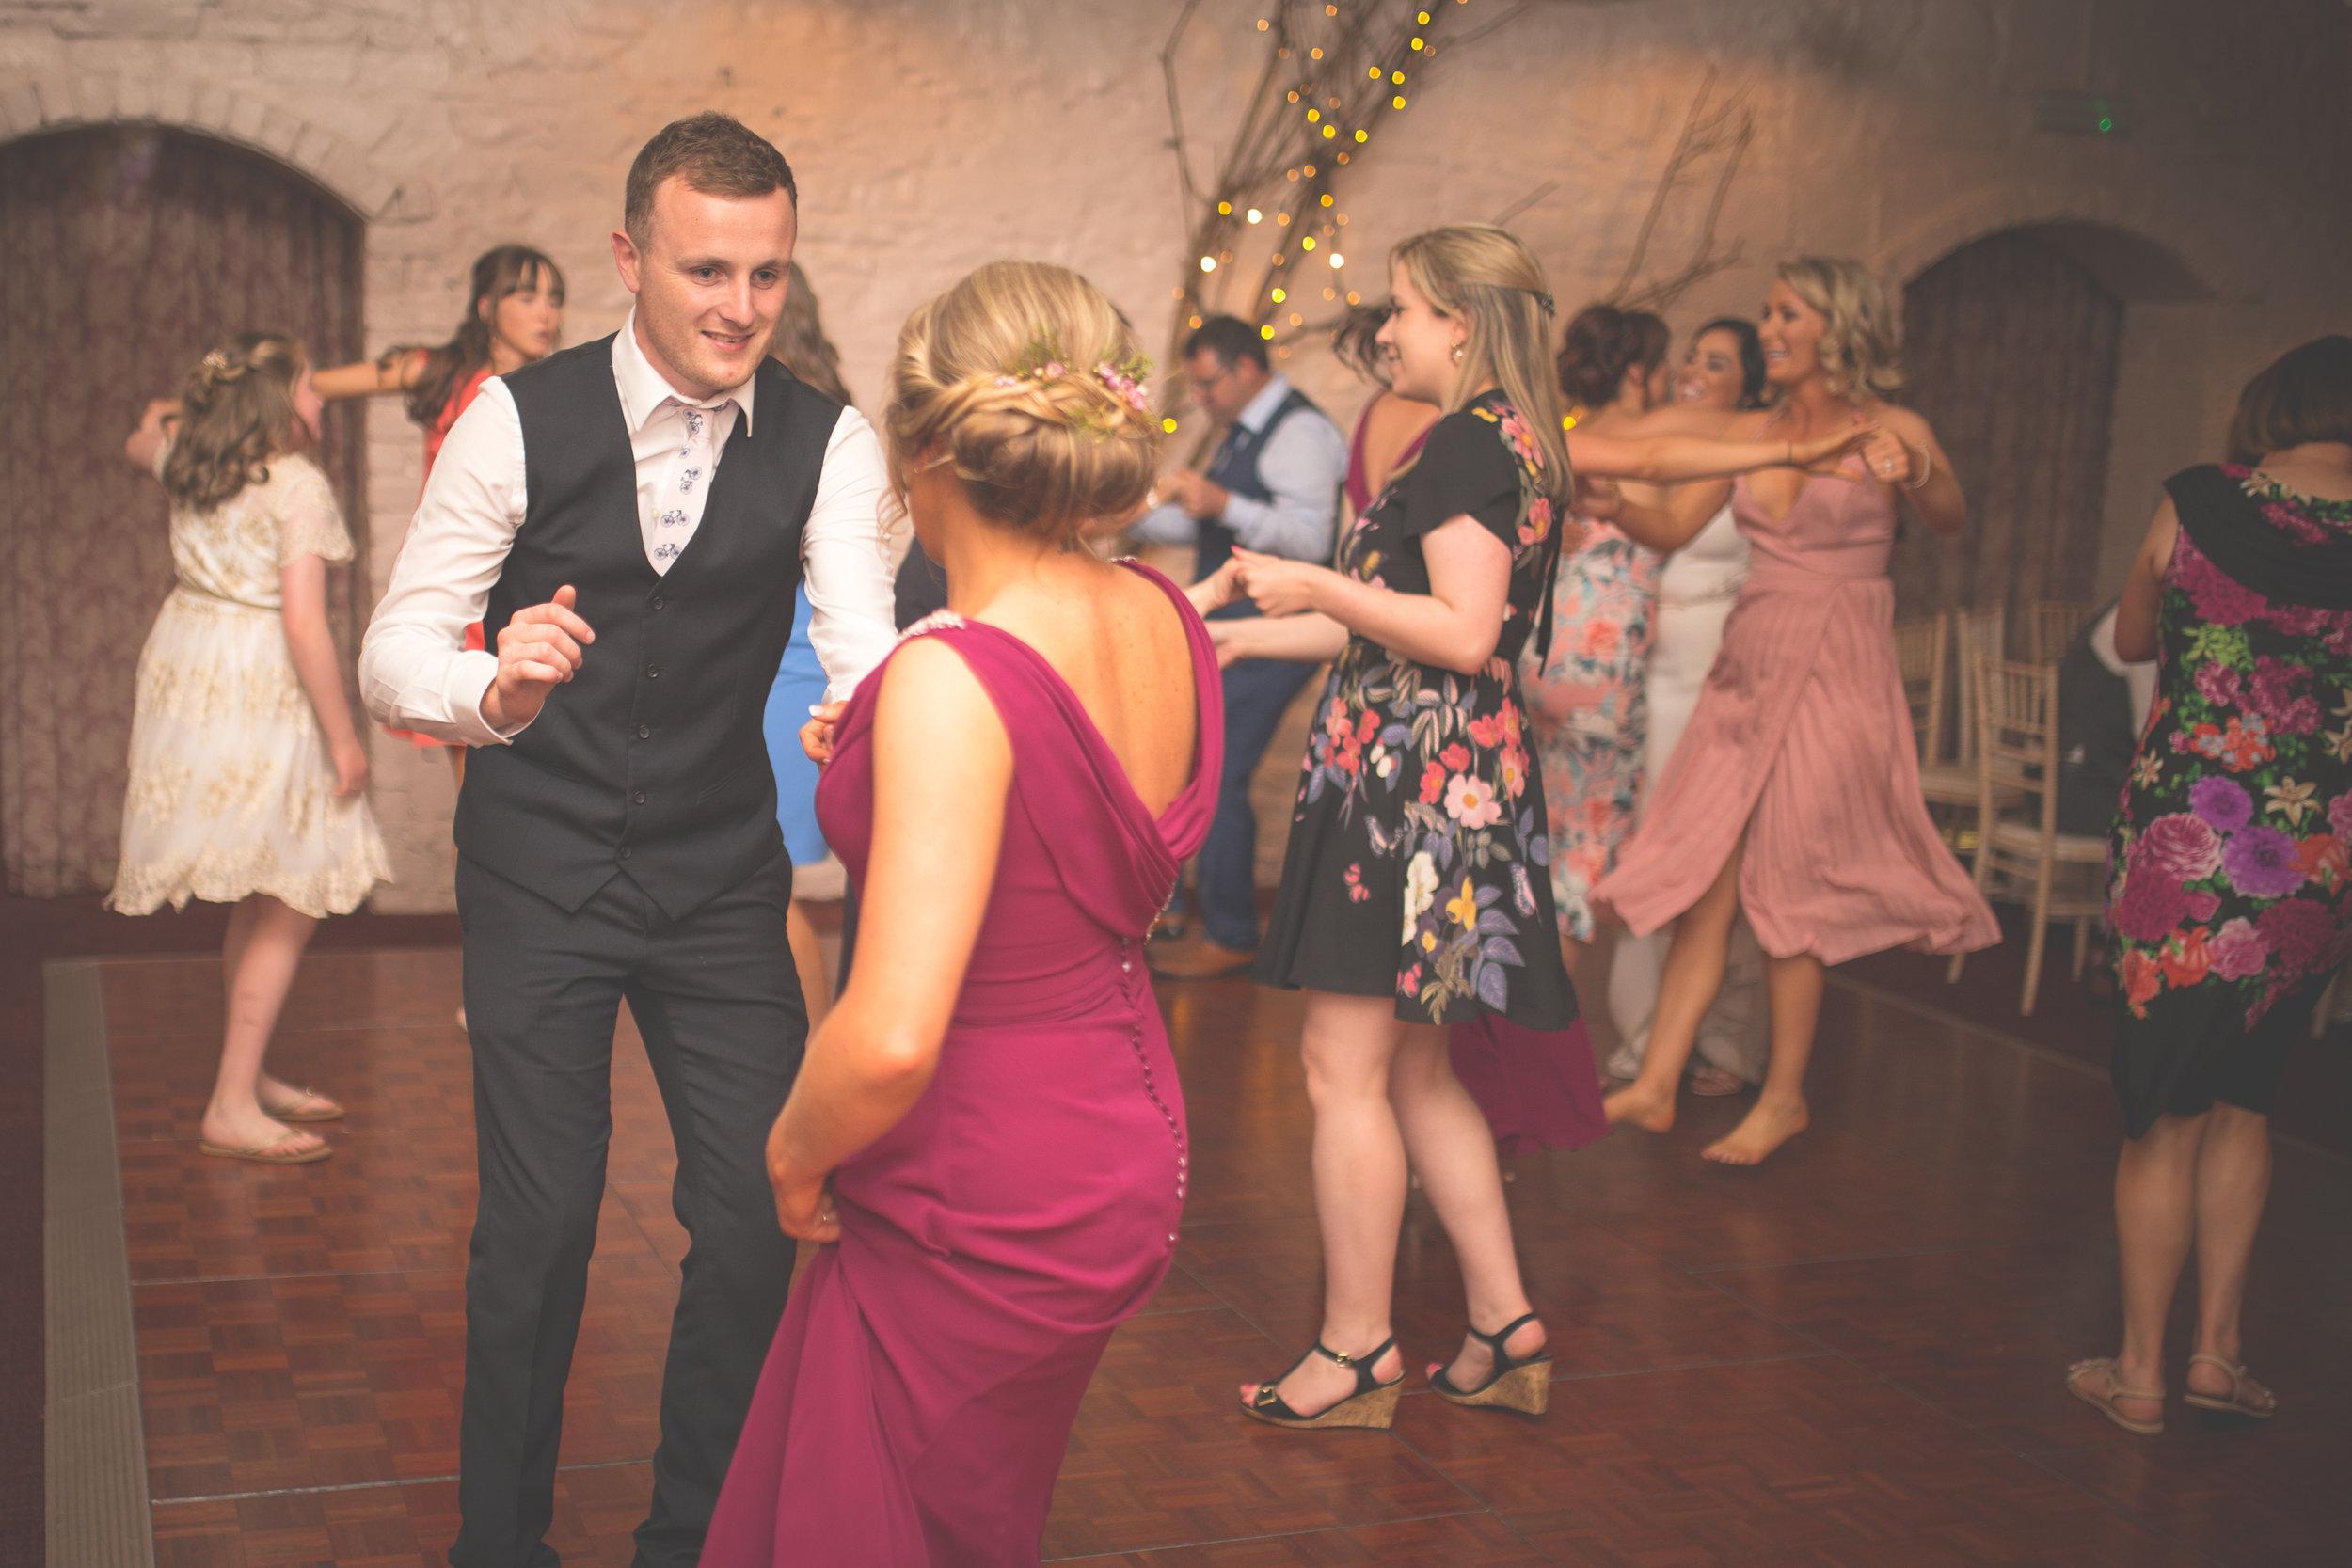 Brian McEwan Wedding Photography | Carol-Annee & Sean | The Dancing-88.jpg